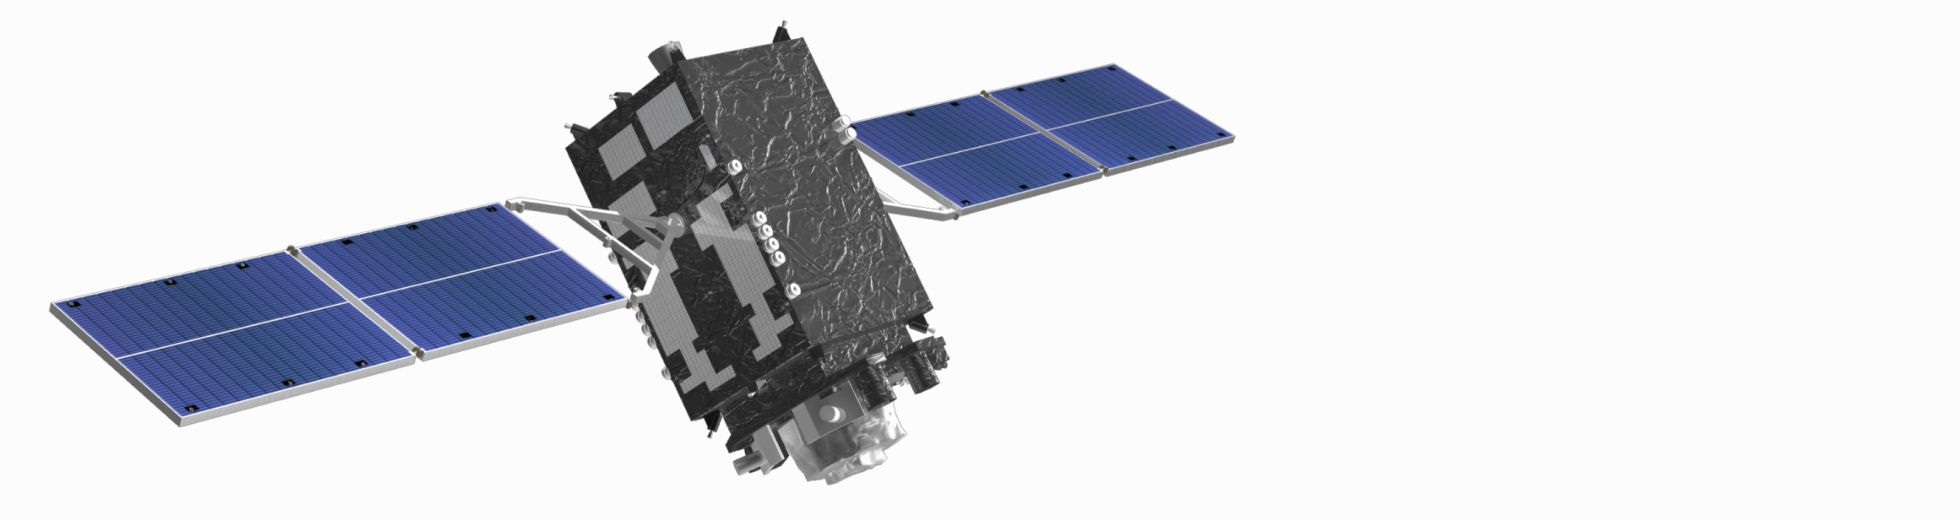 Qzss Quasi Zenith Satellite System Cabinet Office Japan